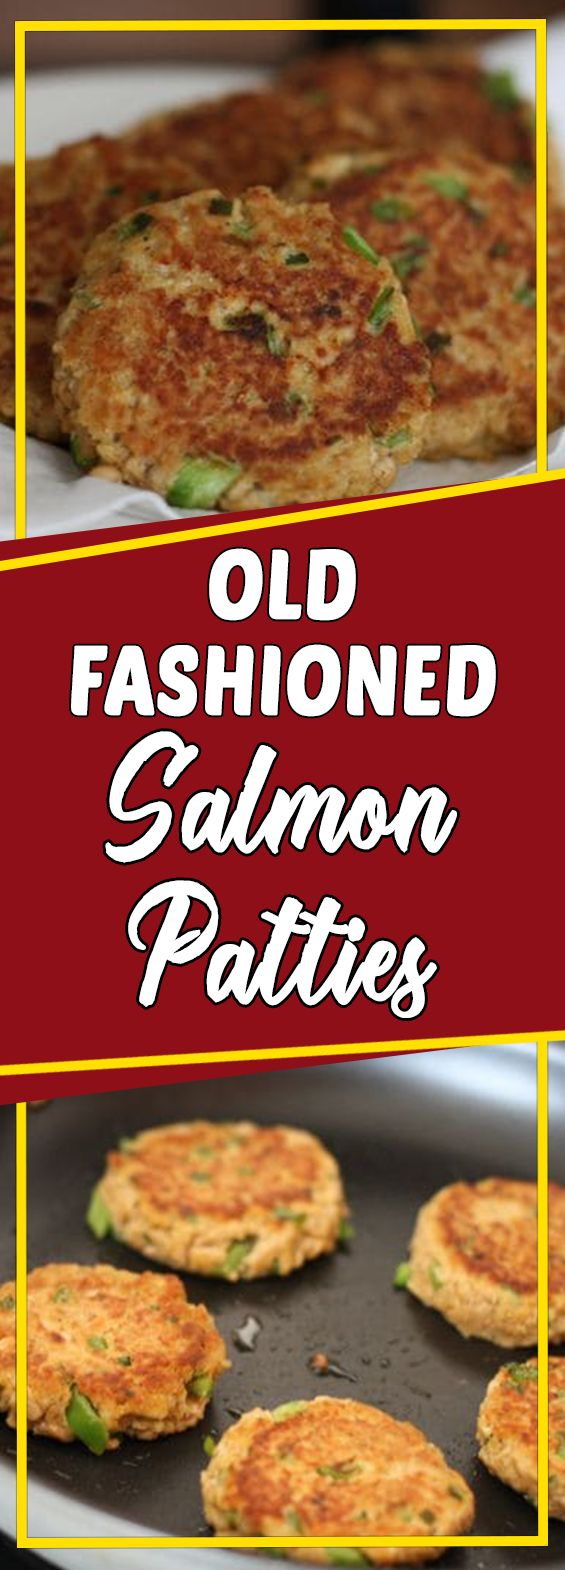 Old Fashioned Salmon Patties #food #dinnerrecipes #dinner #foodphotography #dinnertime #easydinner